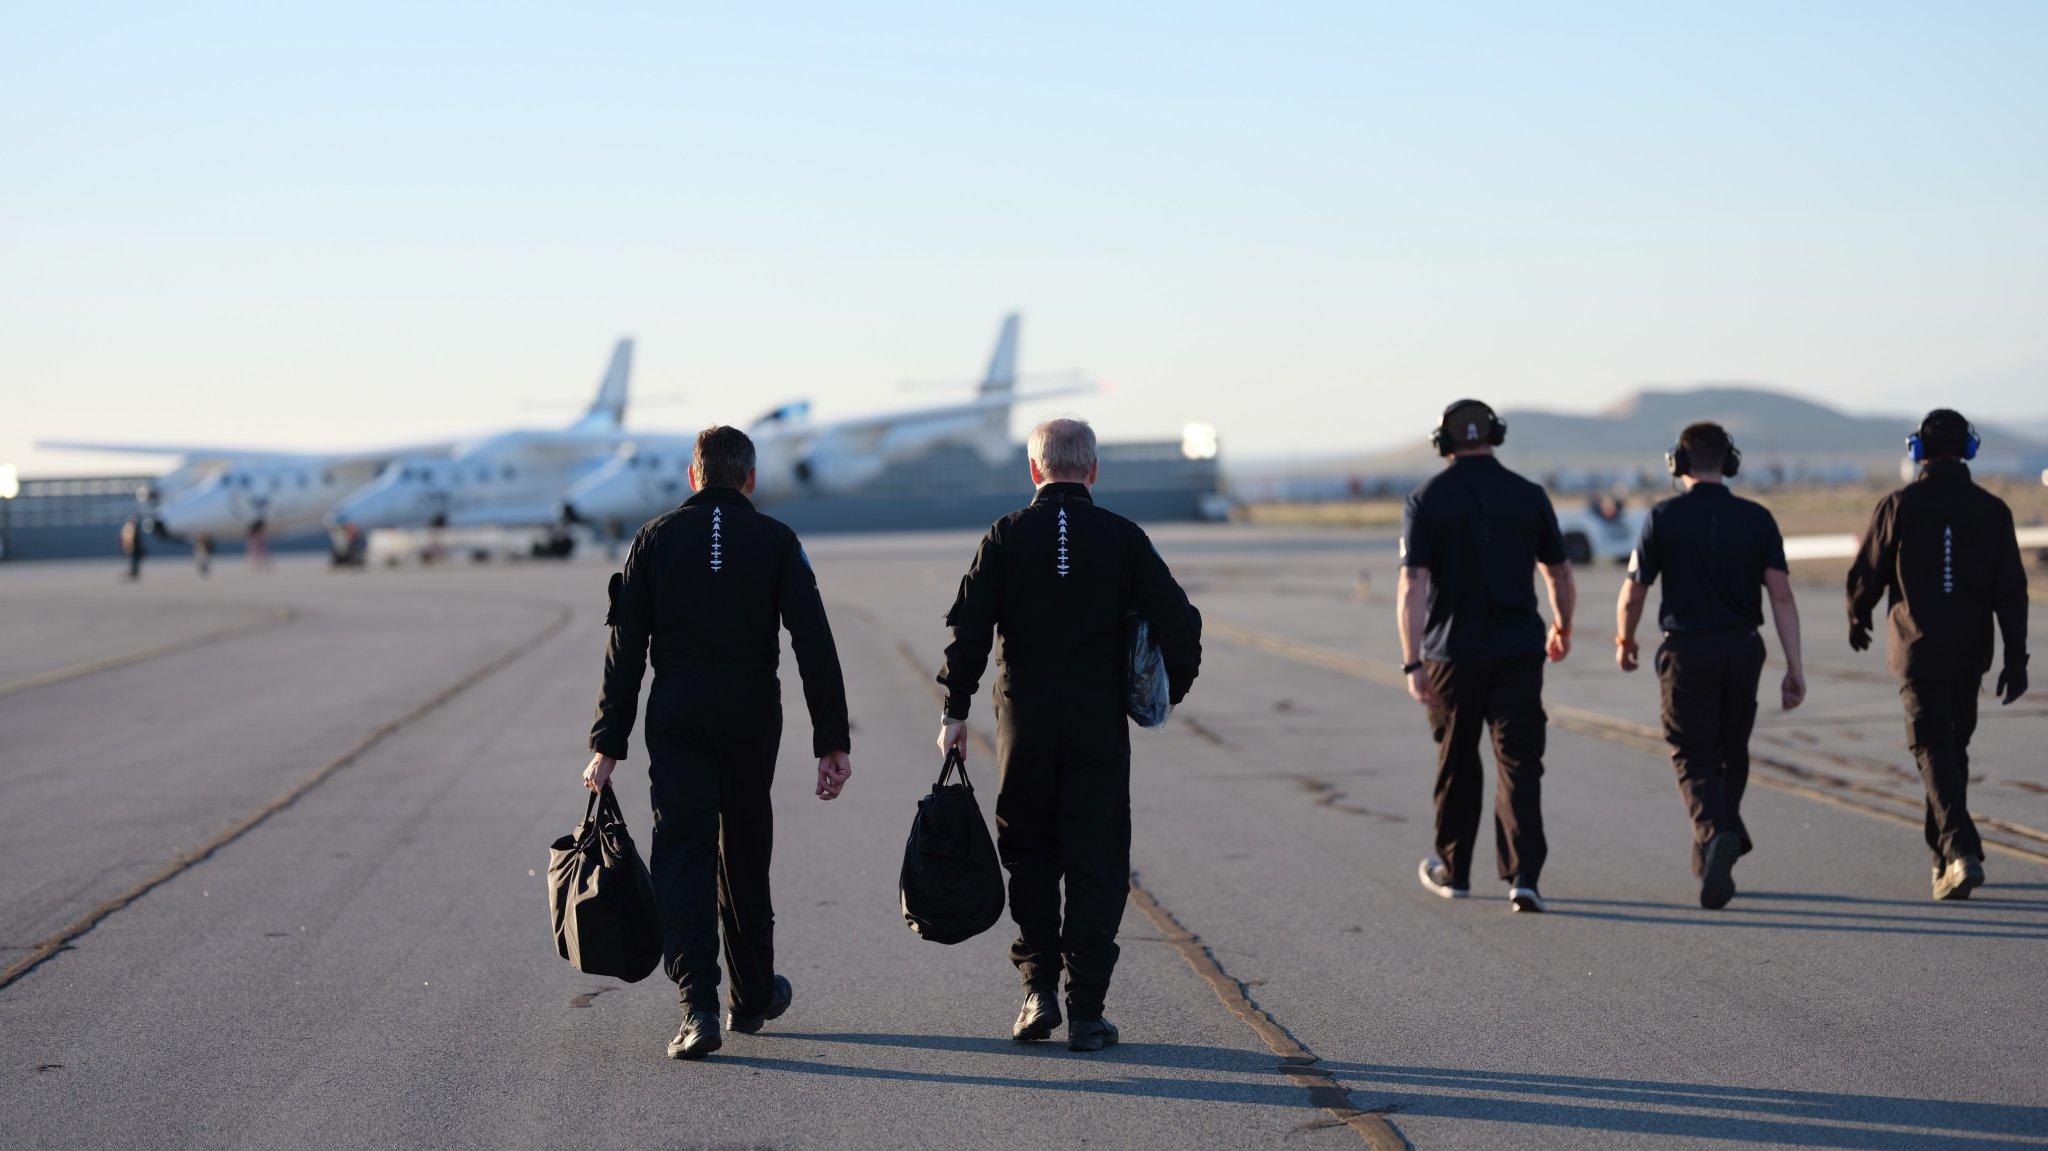 Virgin Galactic test pilots headed for the VSS Unity.